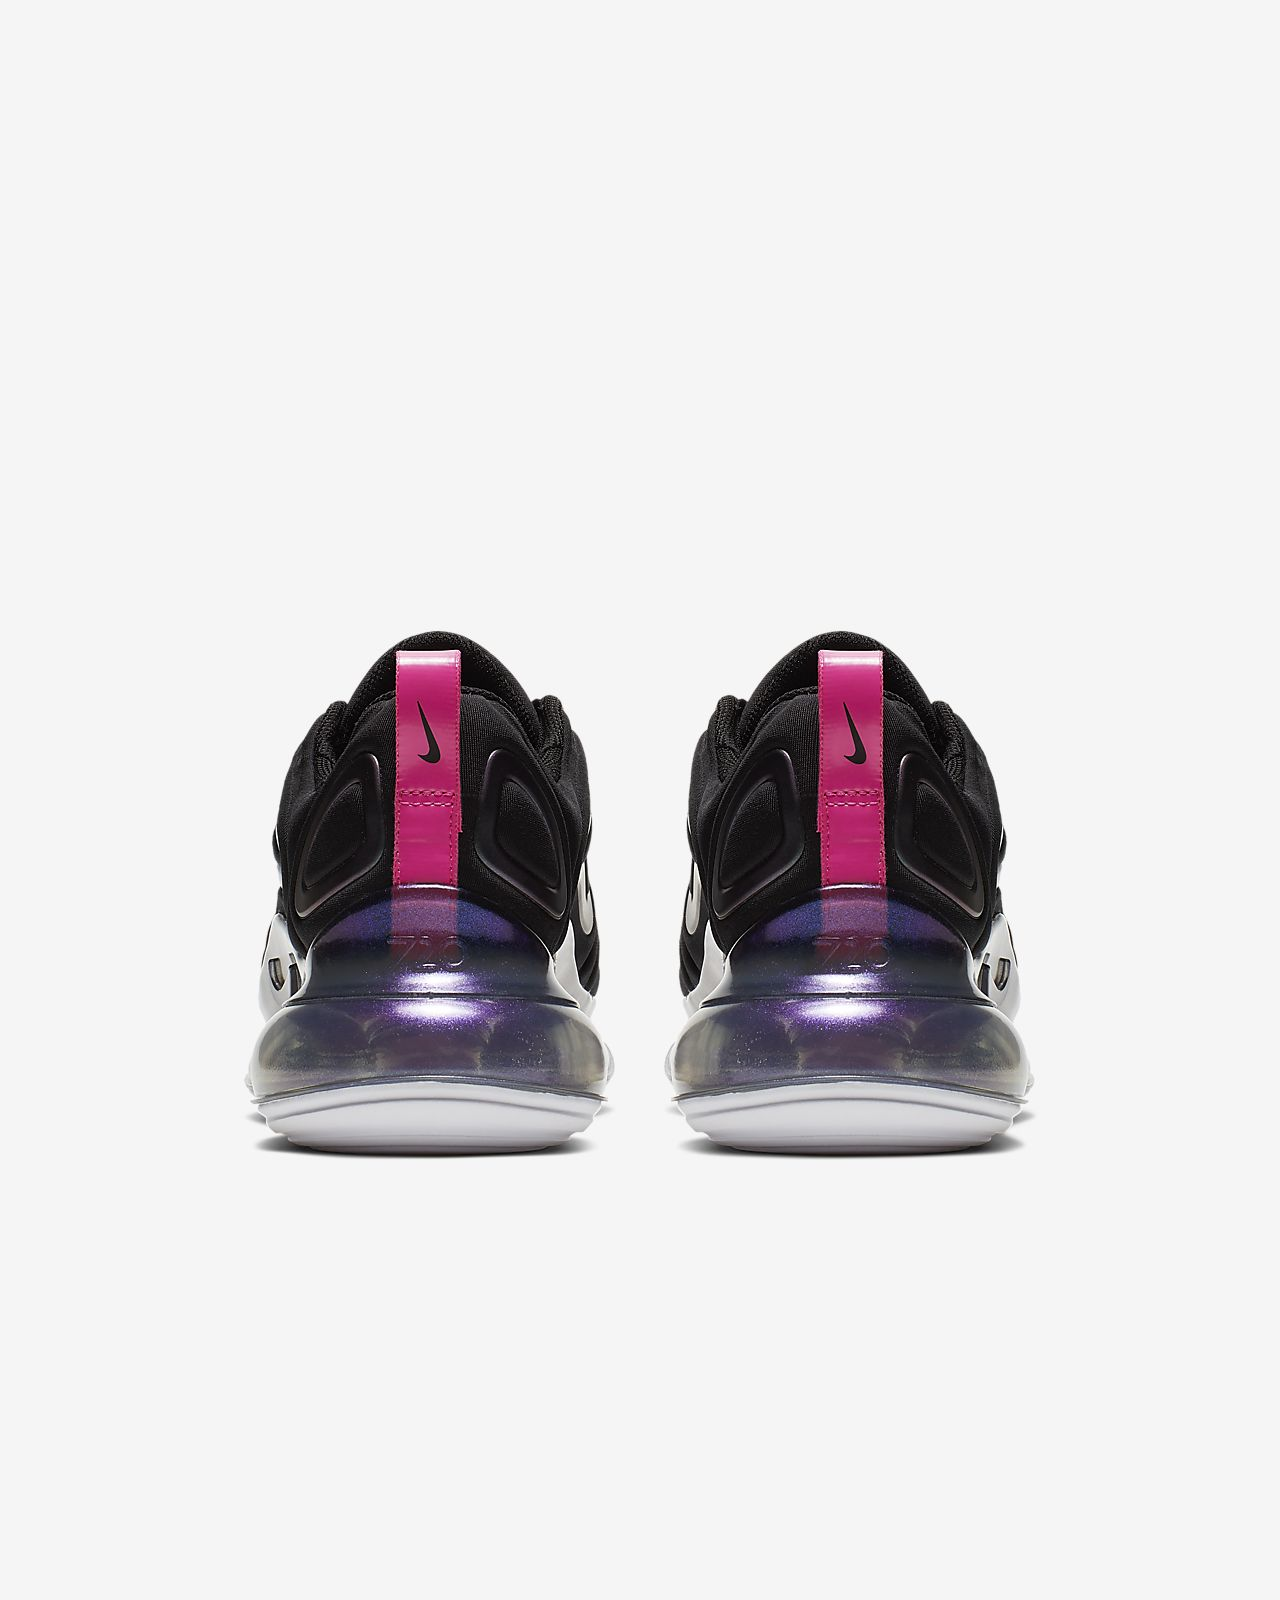 outlet store 712ae b8d3d ... Nike Air Max 720 SE Women s Shoe